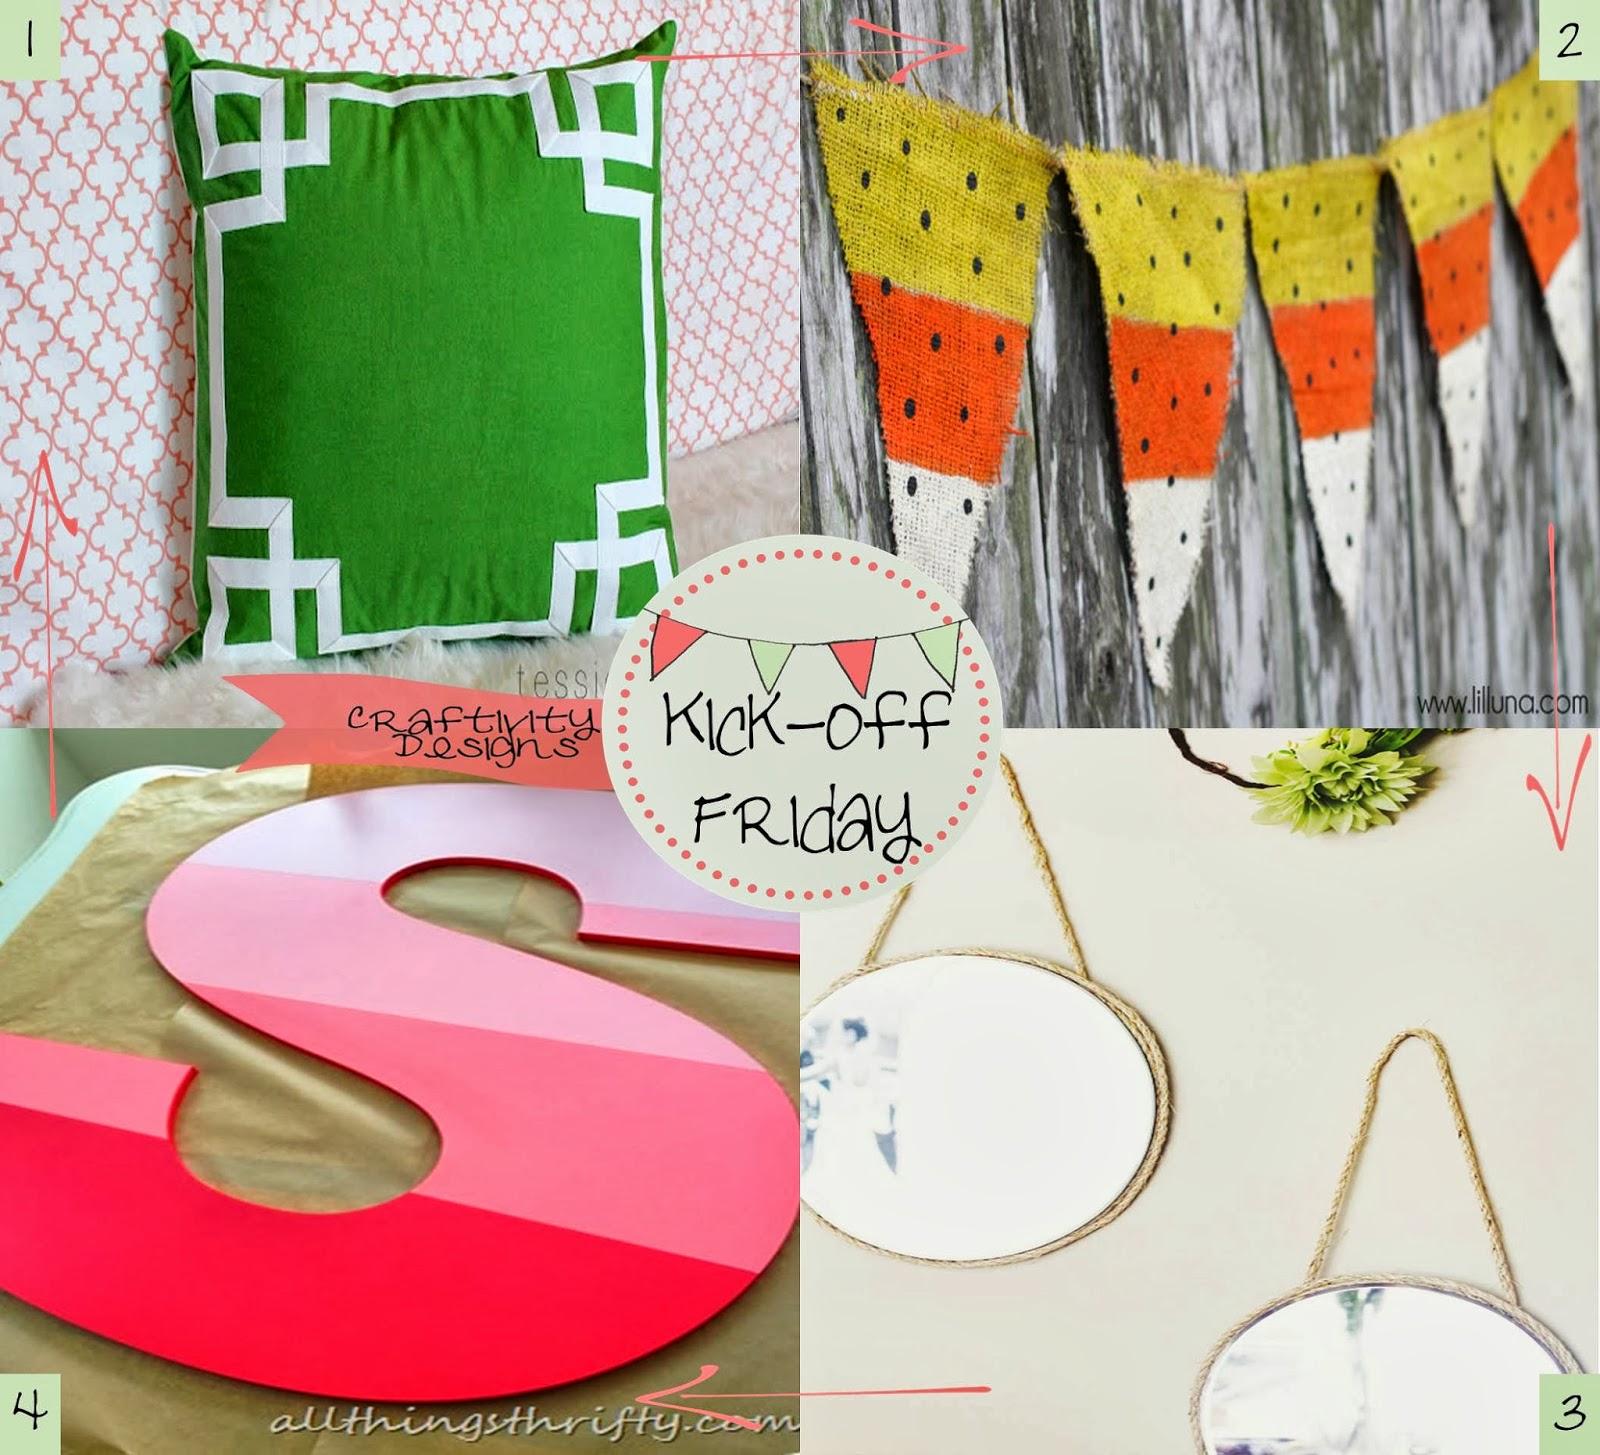 3 Great Swift Y And Thrifty Diy Decorating Ideas: Craftivity Designs